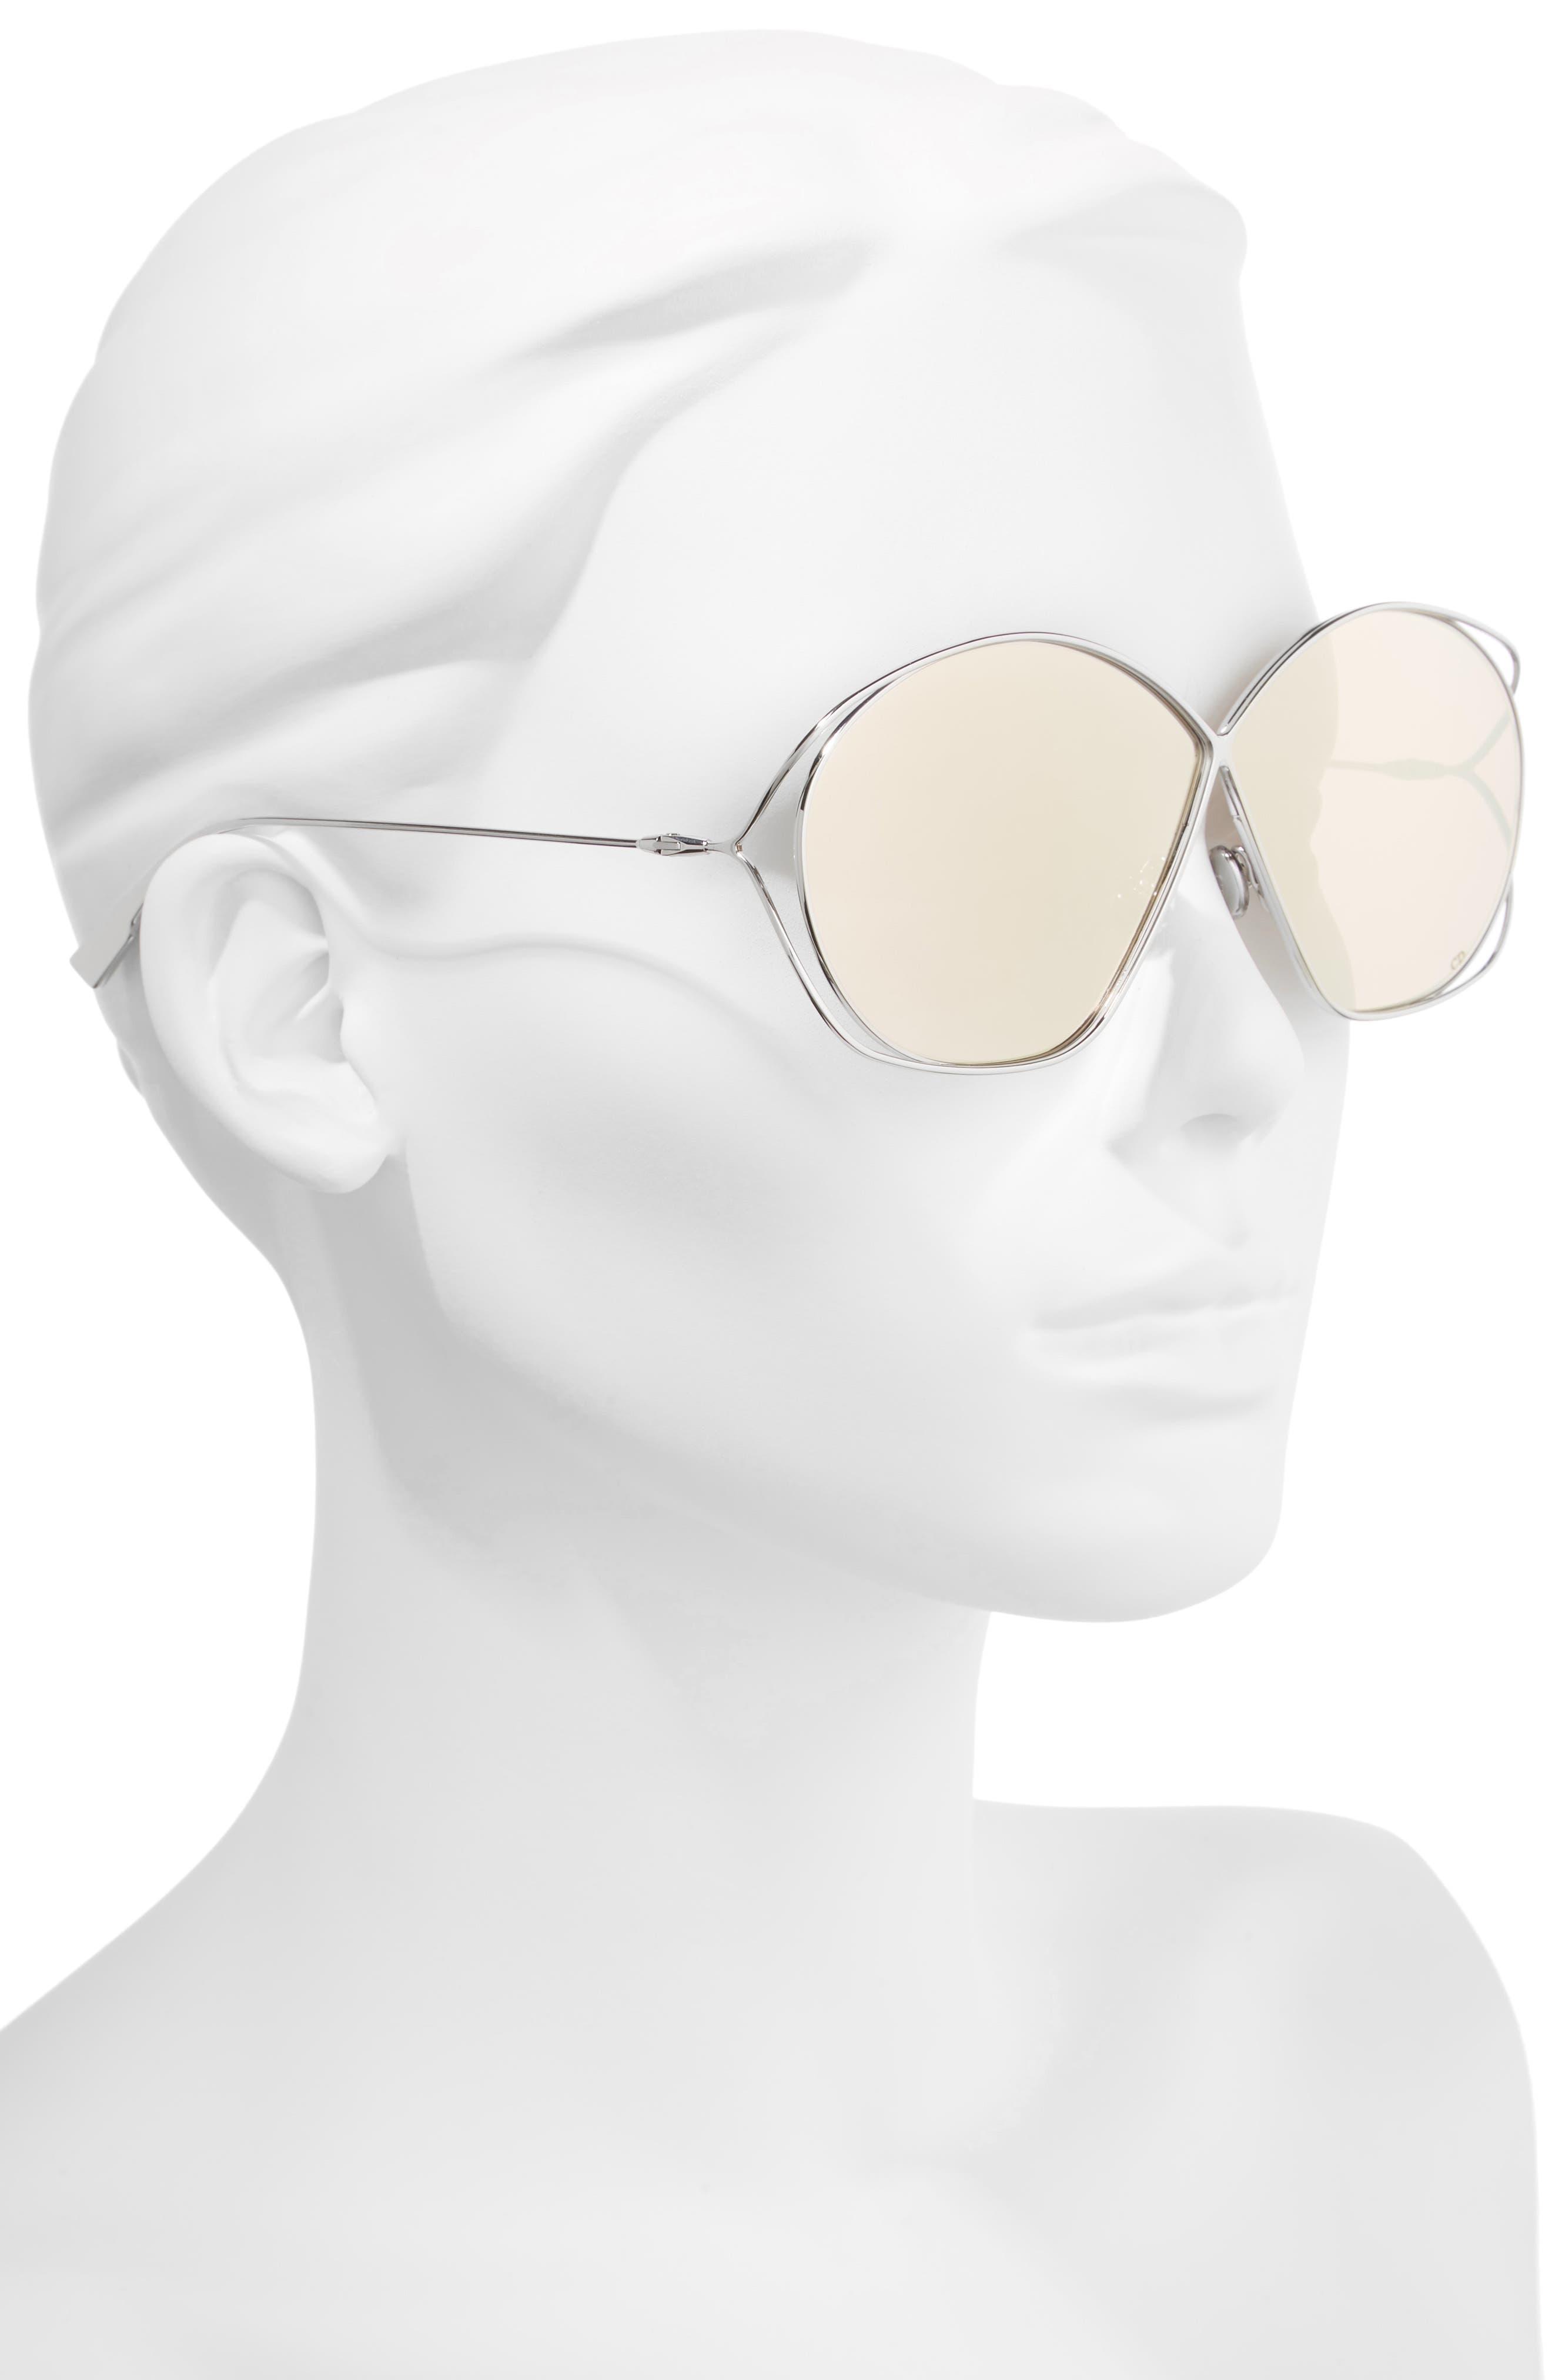 Stellaire 2 68mm Oversize Butterfly Sunglasses,                             Alternate thumbnail 2, color,                             PALLADIUM